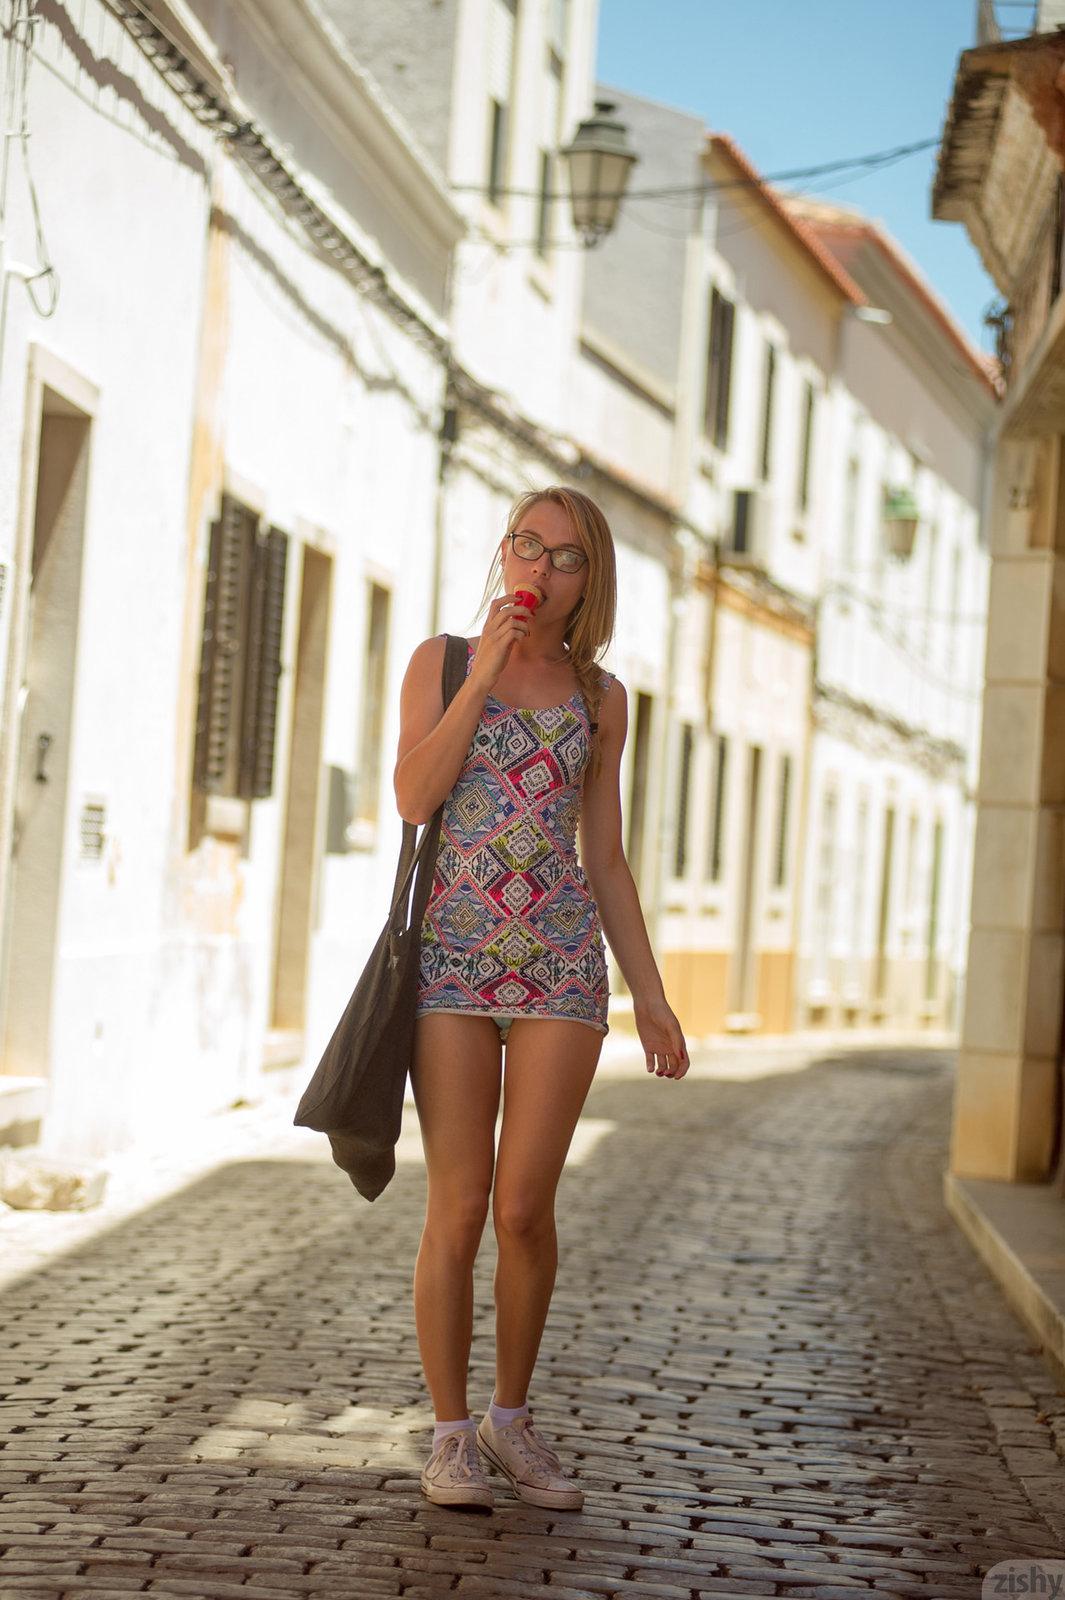 FRIEDA: Ftv girls portugal nude